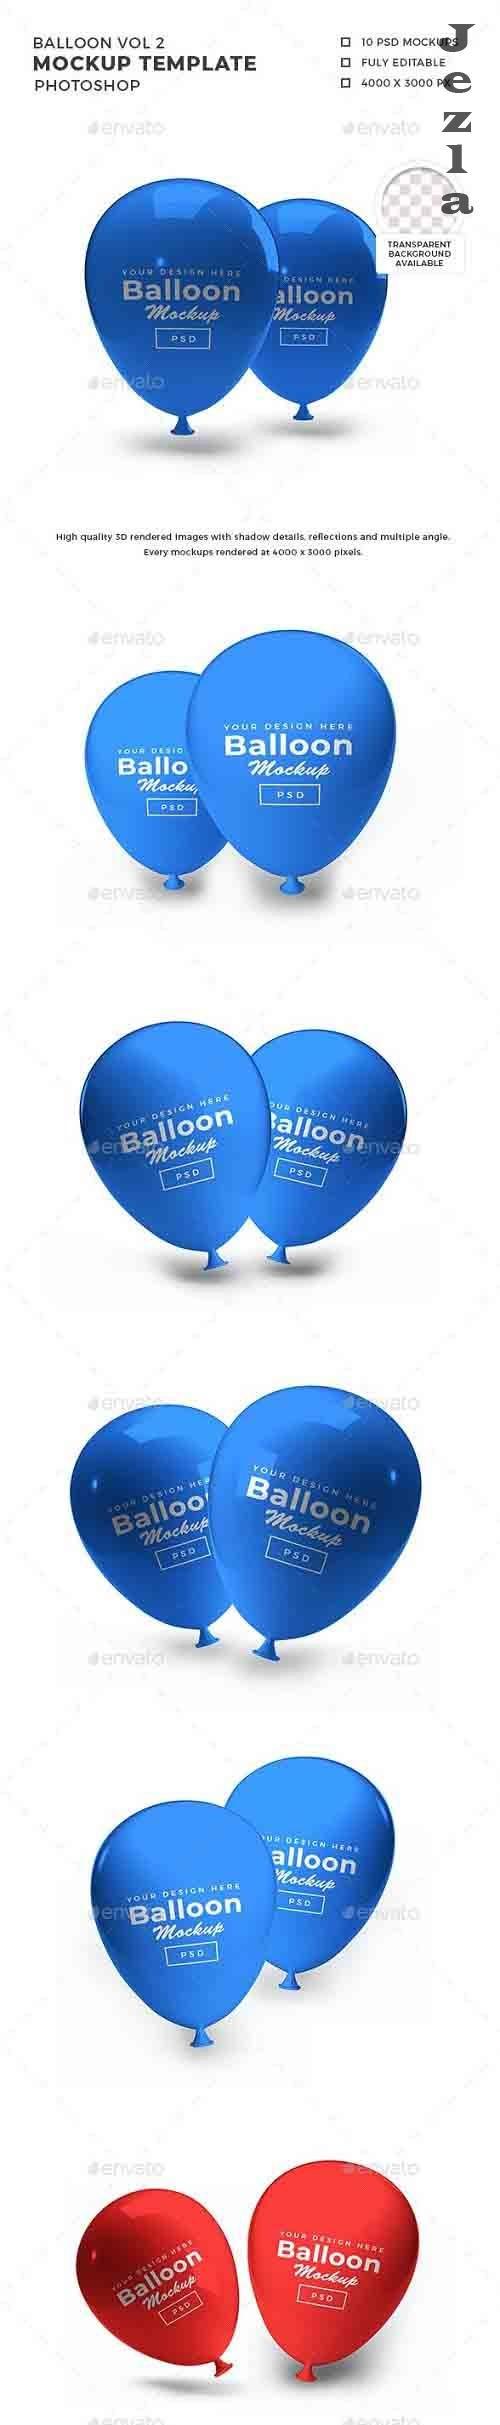 Balloon 3D Mockup Template Vol 2 - 32380478 - 1393201